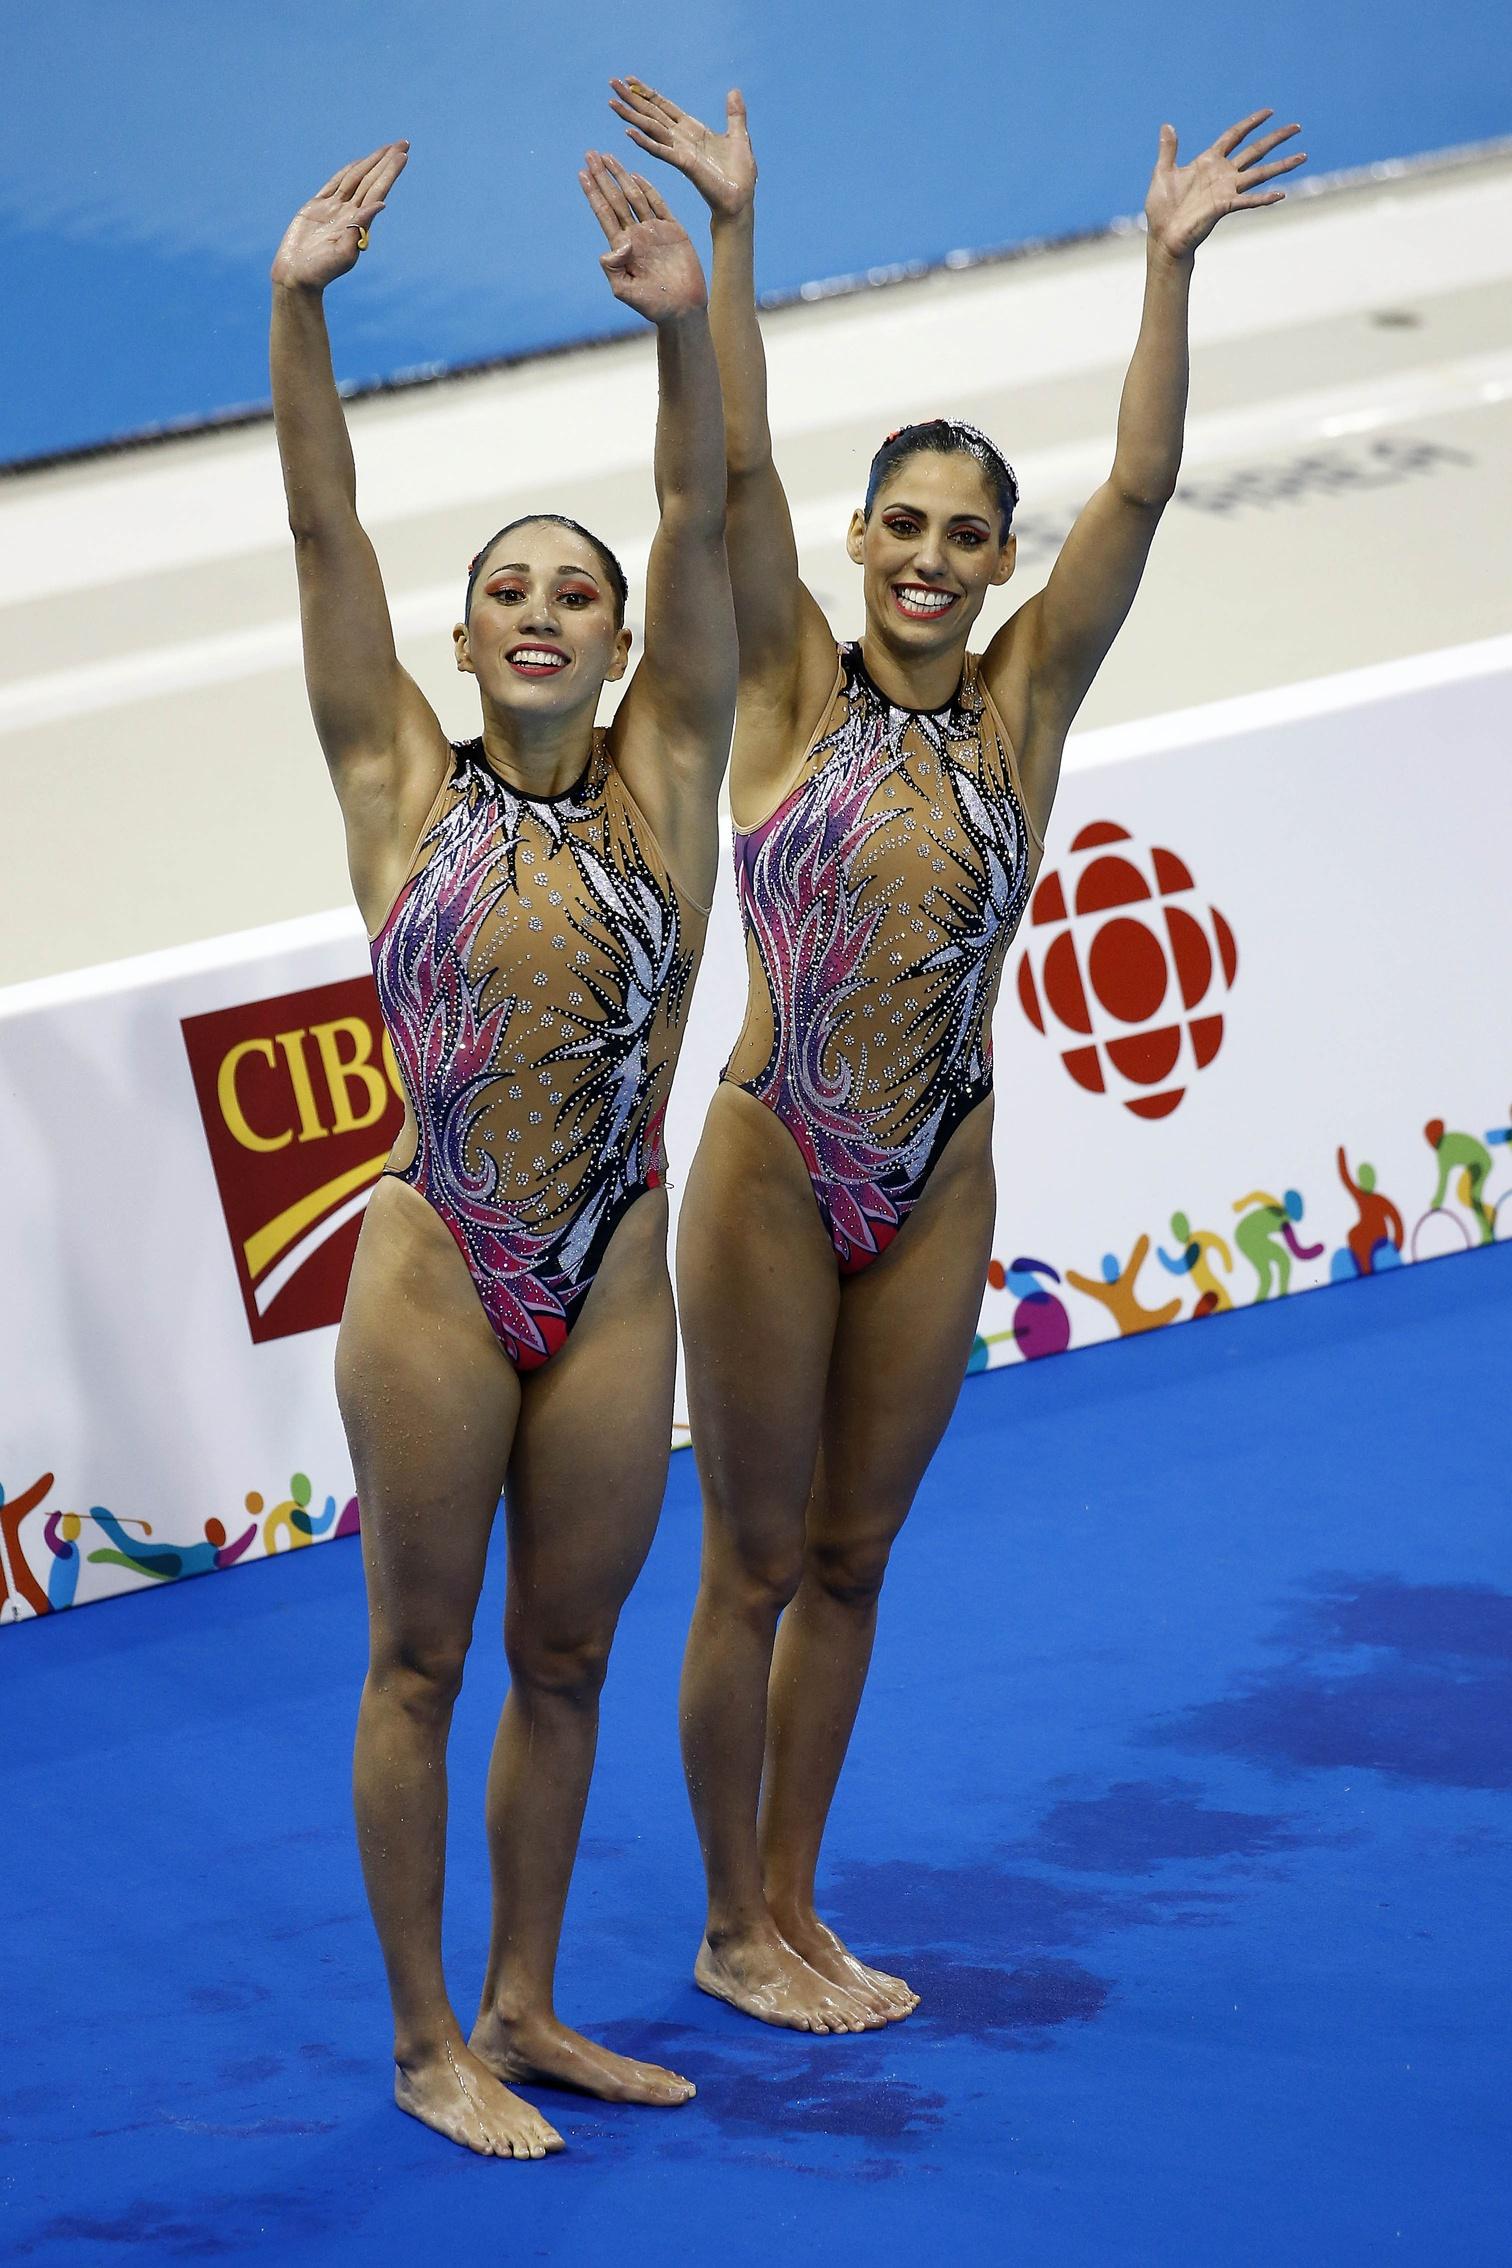 Synchro swimming pan american games 2015 20 swimming world news